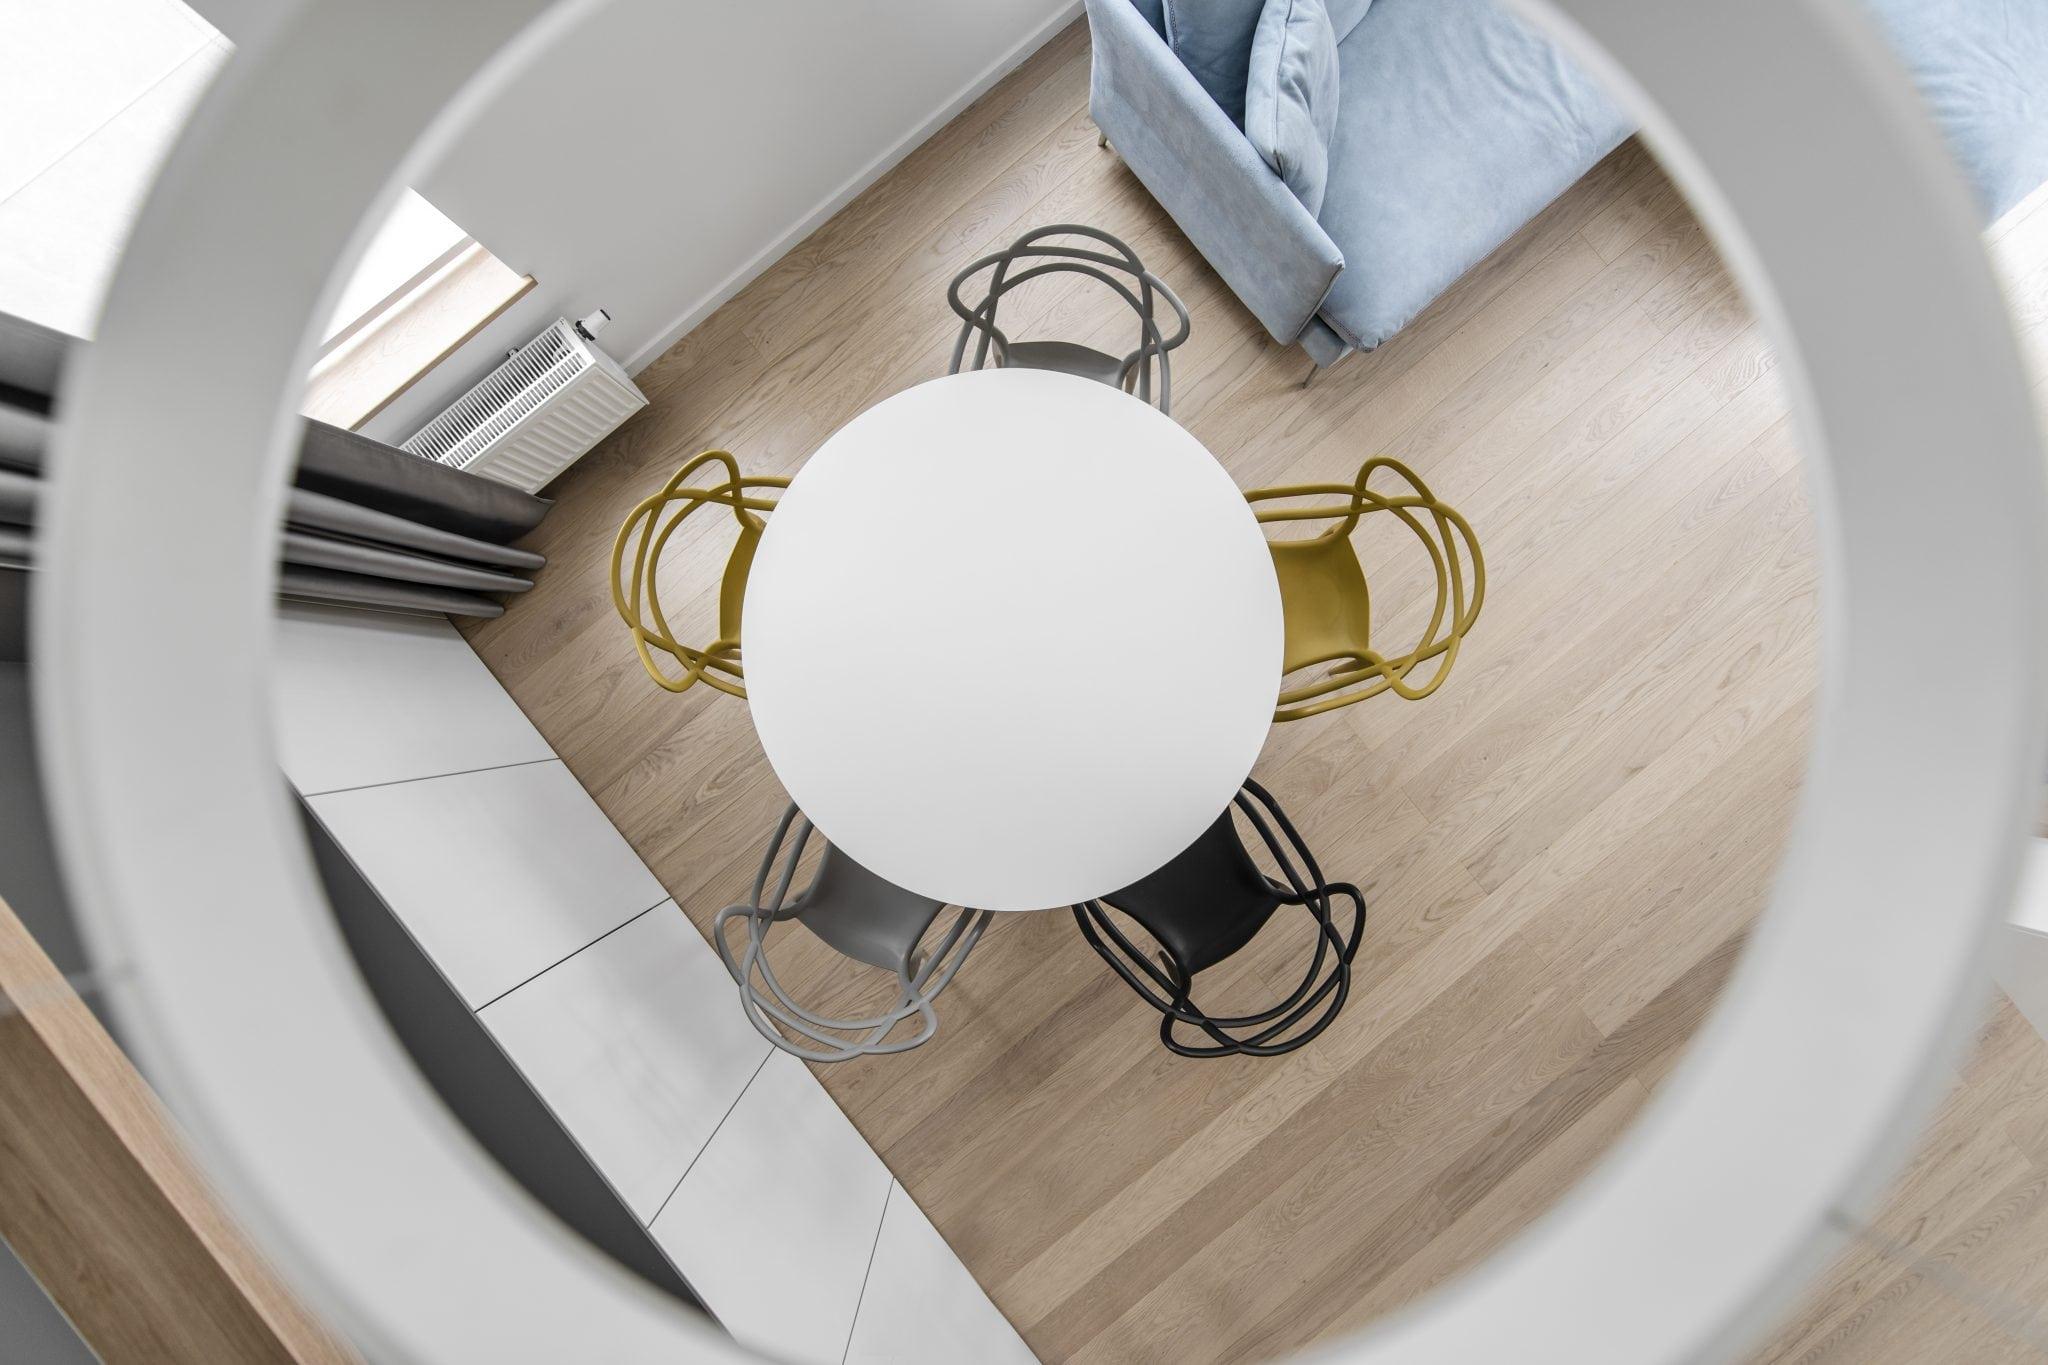 Moderniu baldu gamyba pagal uzsakyma